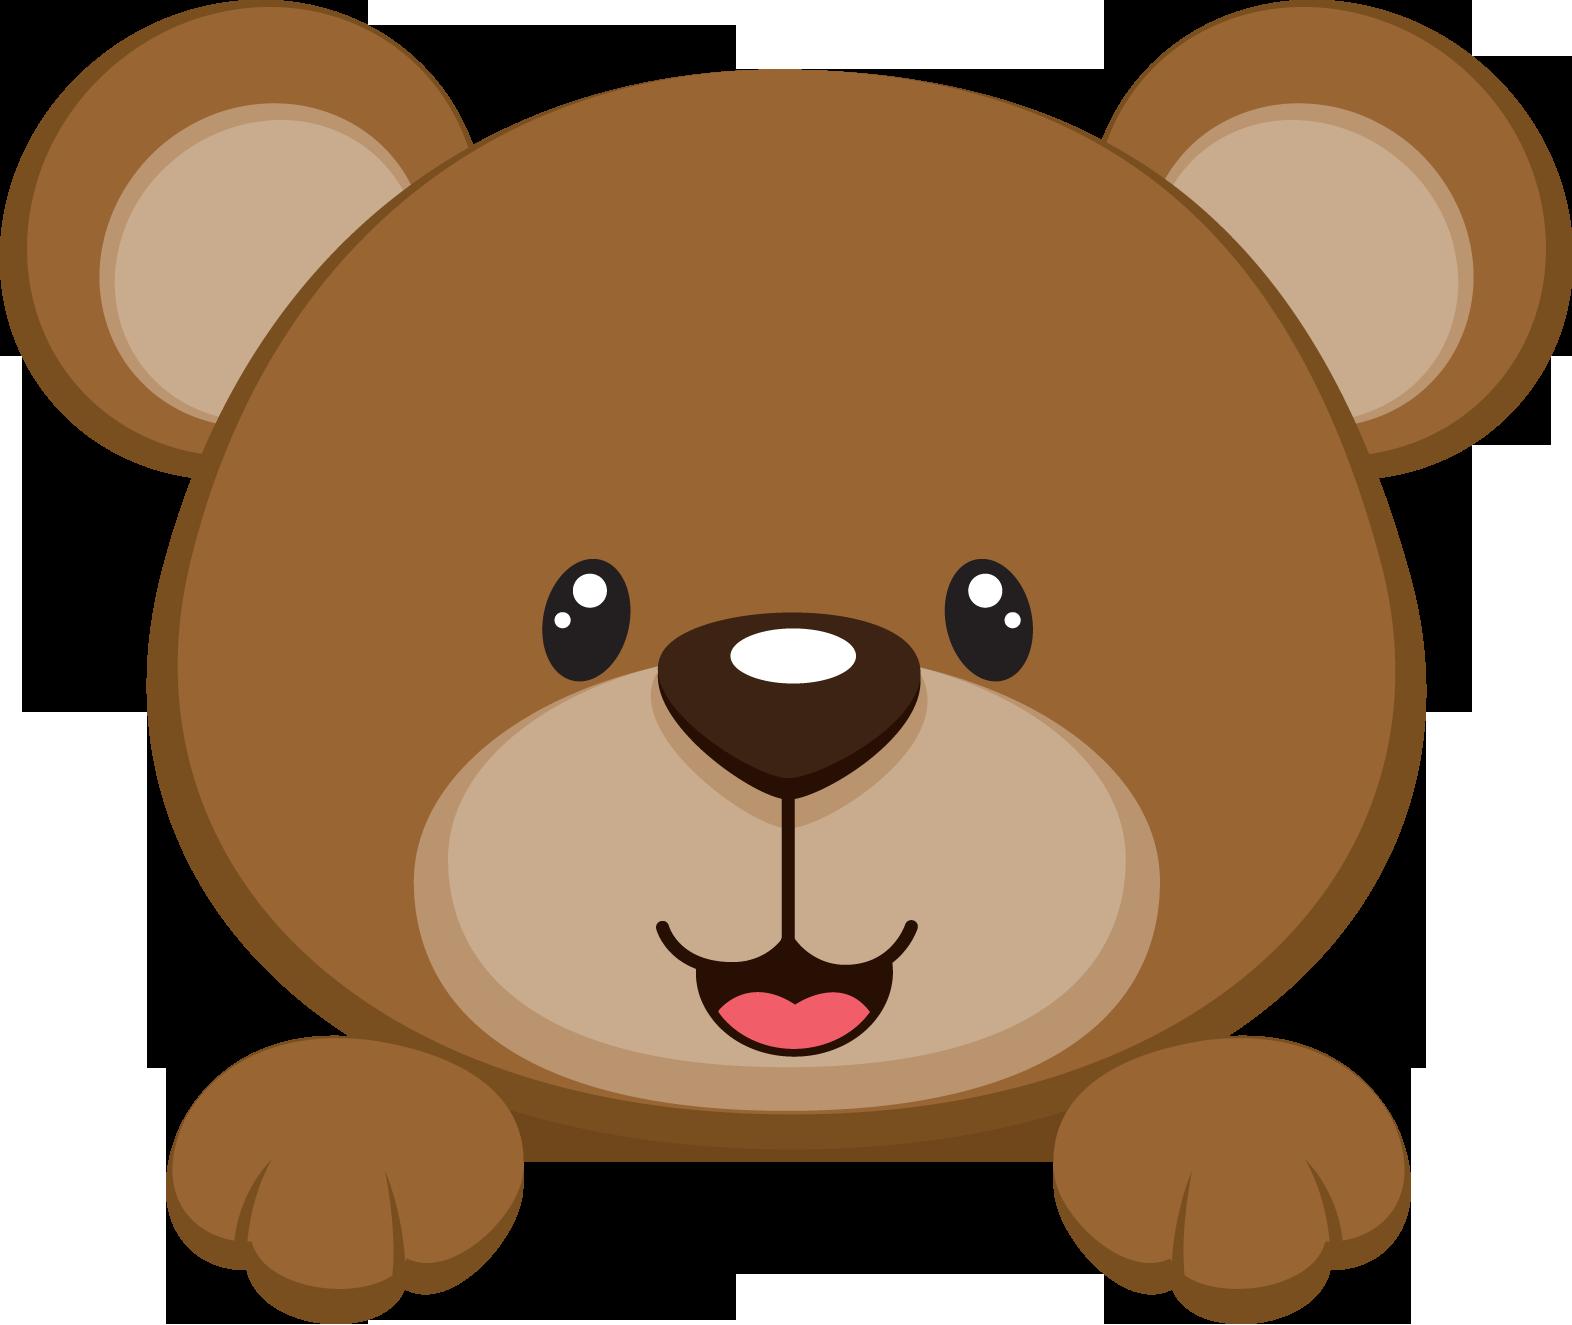 Bear eating fish clipart clipart free download Só imagens: Ursinho Marrom | Osos cafés colección | Pinterest ... clipart free download